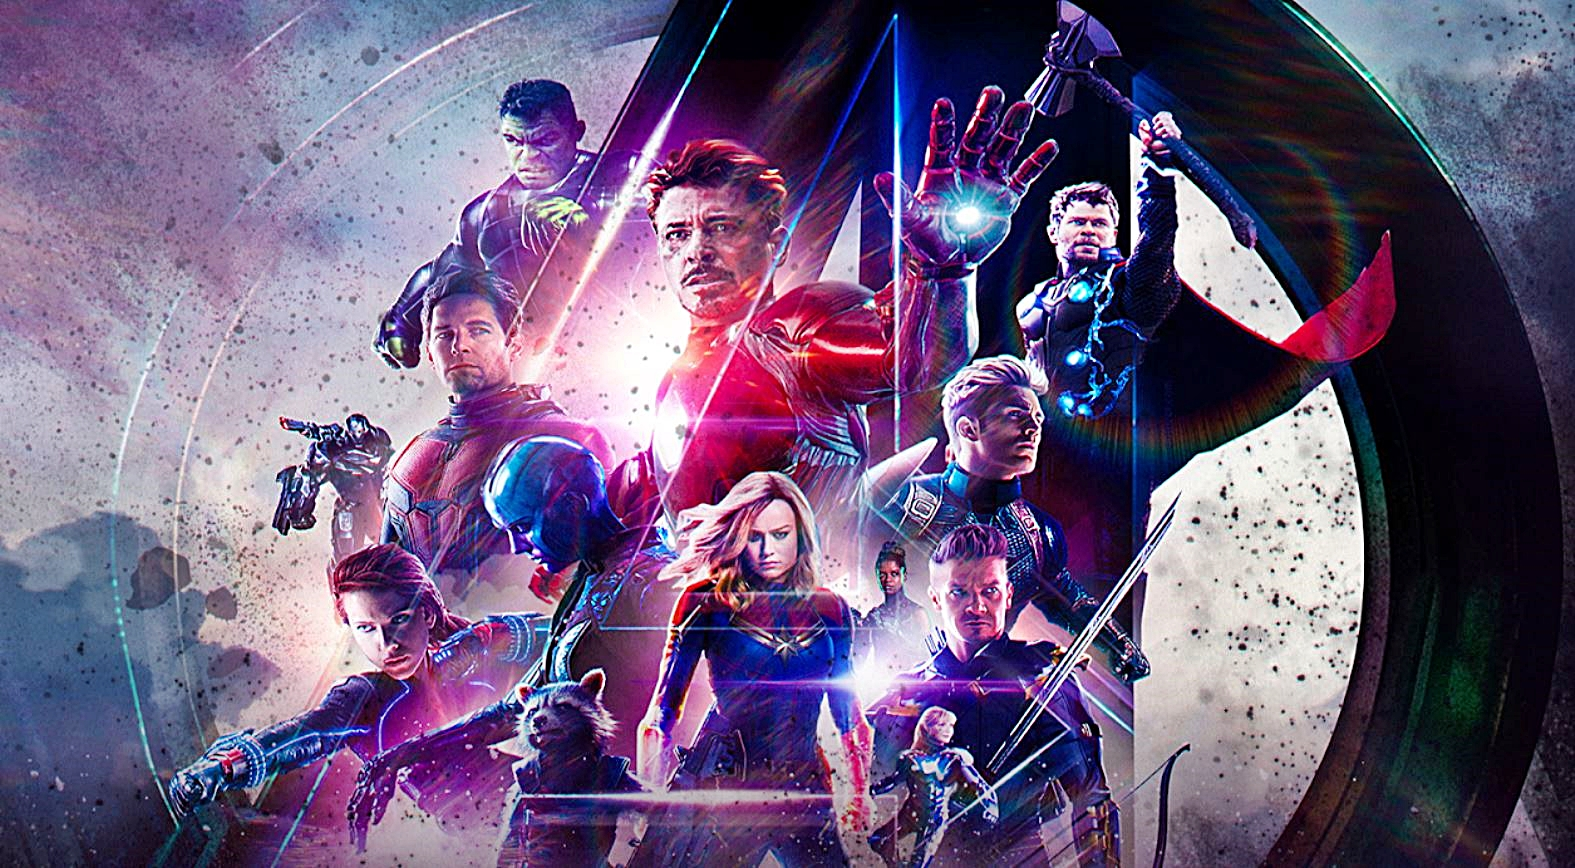 Fans Mcu Mengaku Sudah Tonton Avengers Endgame 103 Kali Portal Wanita Muda